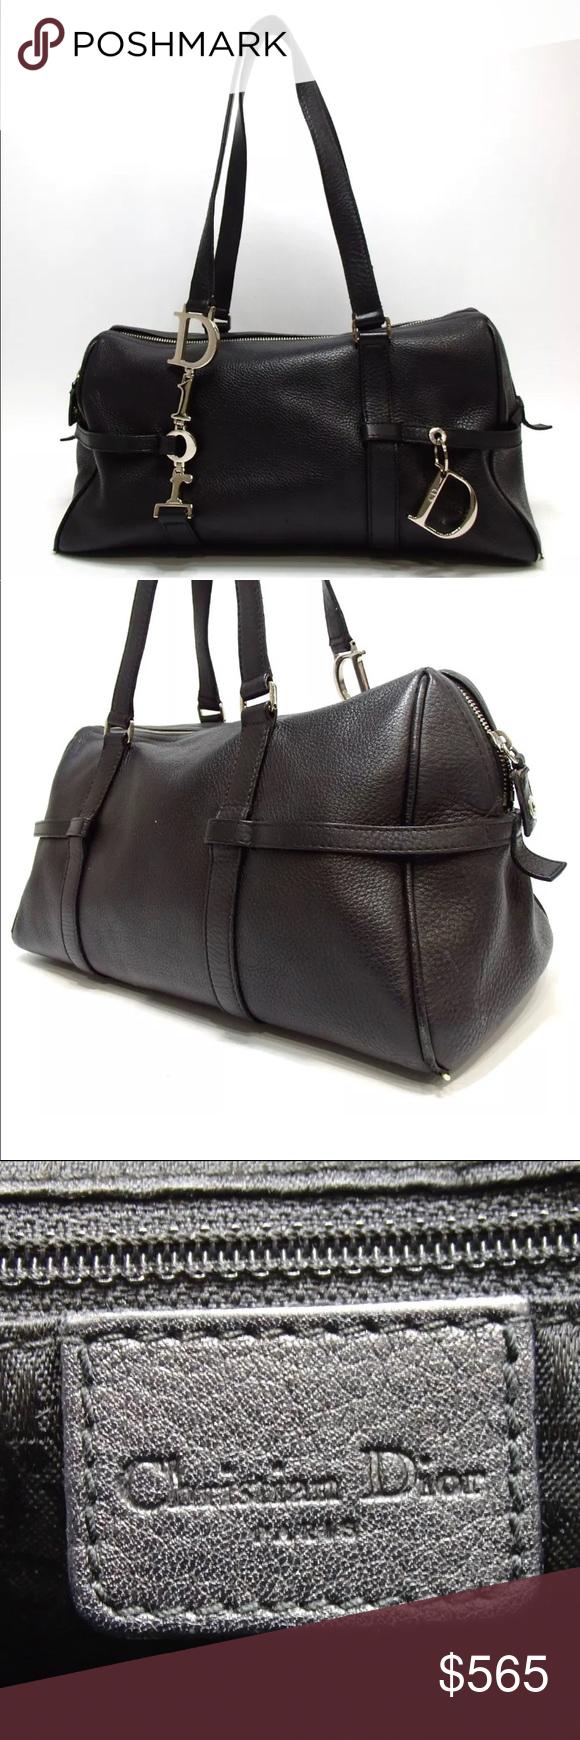 "Christian Dior charm shoulder bag Category  Handbag Brand  Christian Dior  Size W33cm x H17cm x D15cm Handle 43cm W13.0""x H6.7""x D5.9"" Handle 16.9   Color  ... 77b2939b8fa7a"